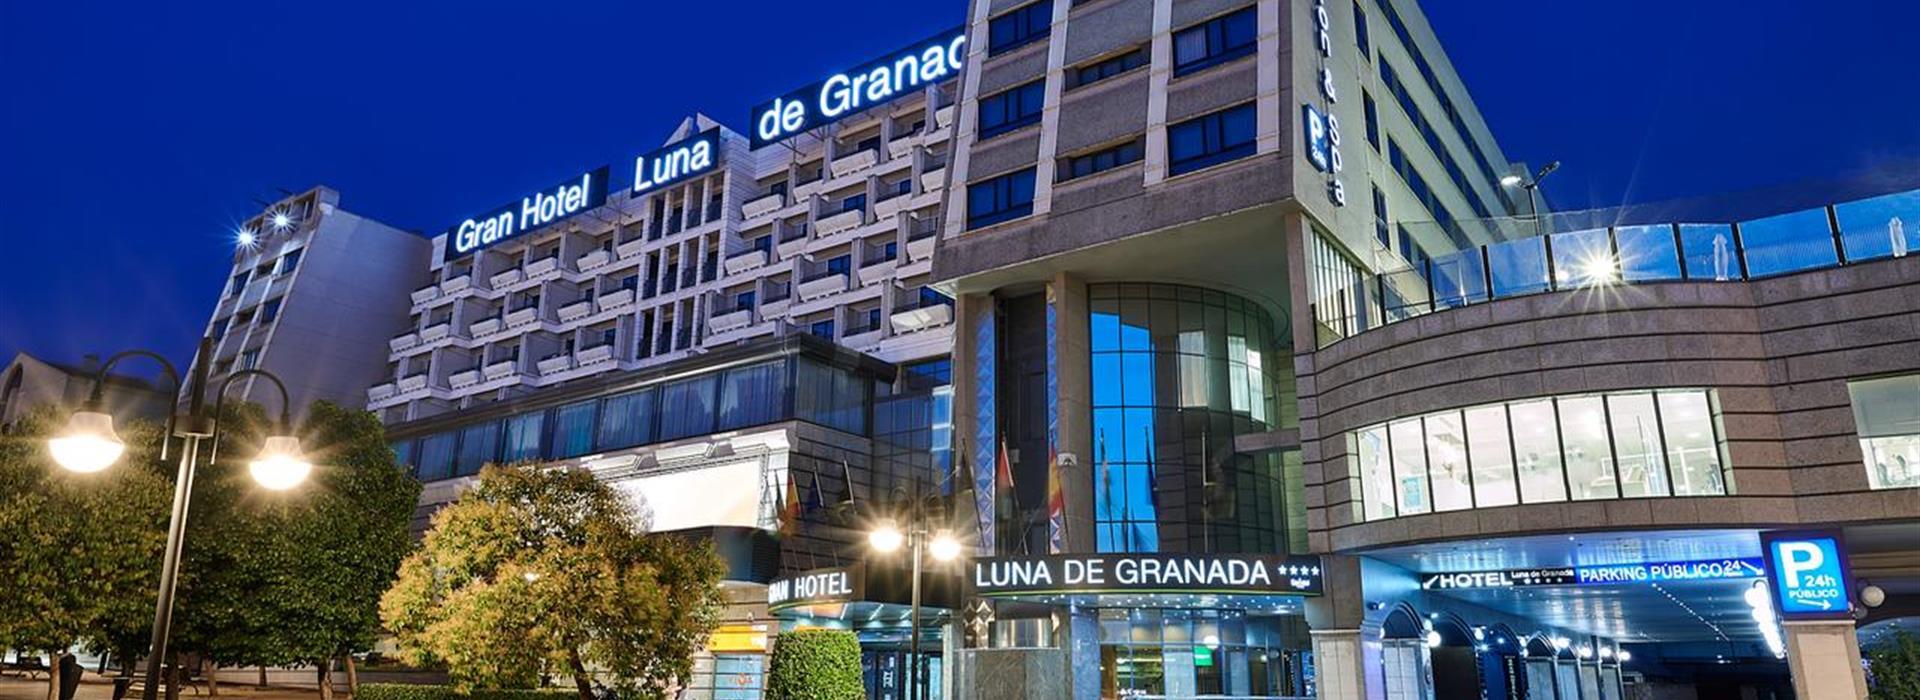 sercotel-gran-hotel-luna-de-granada